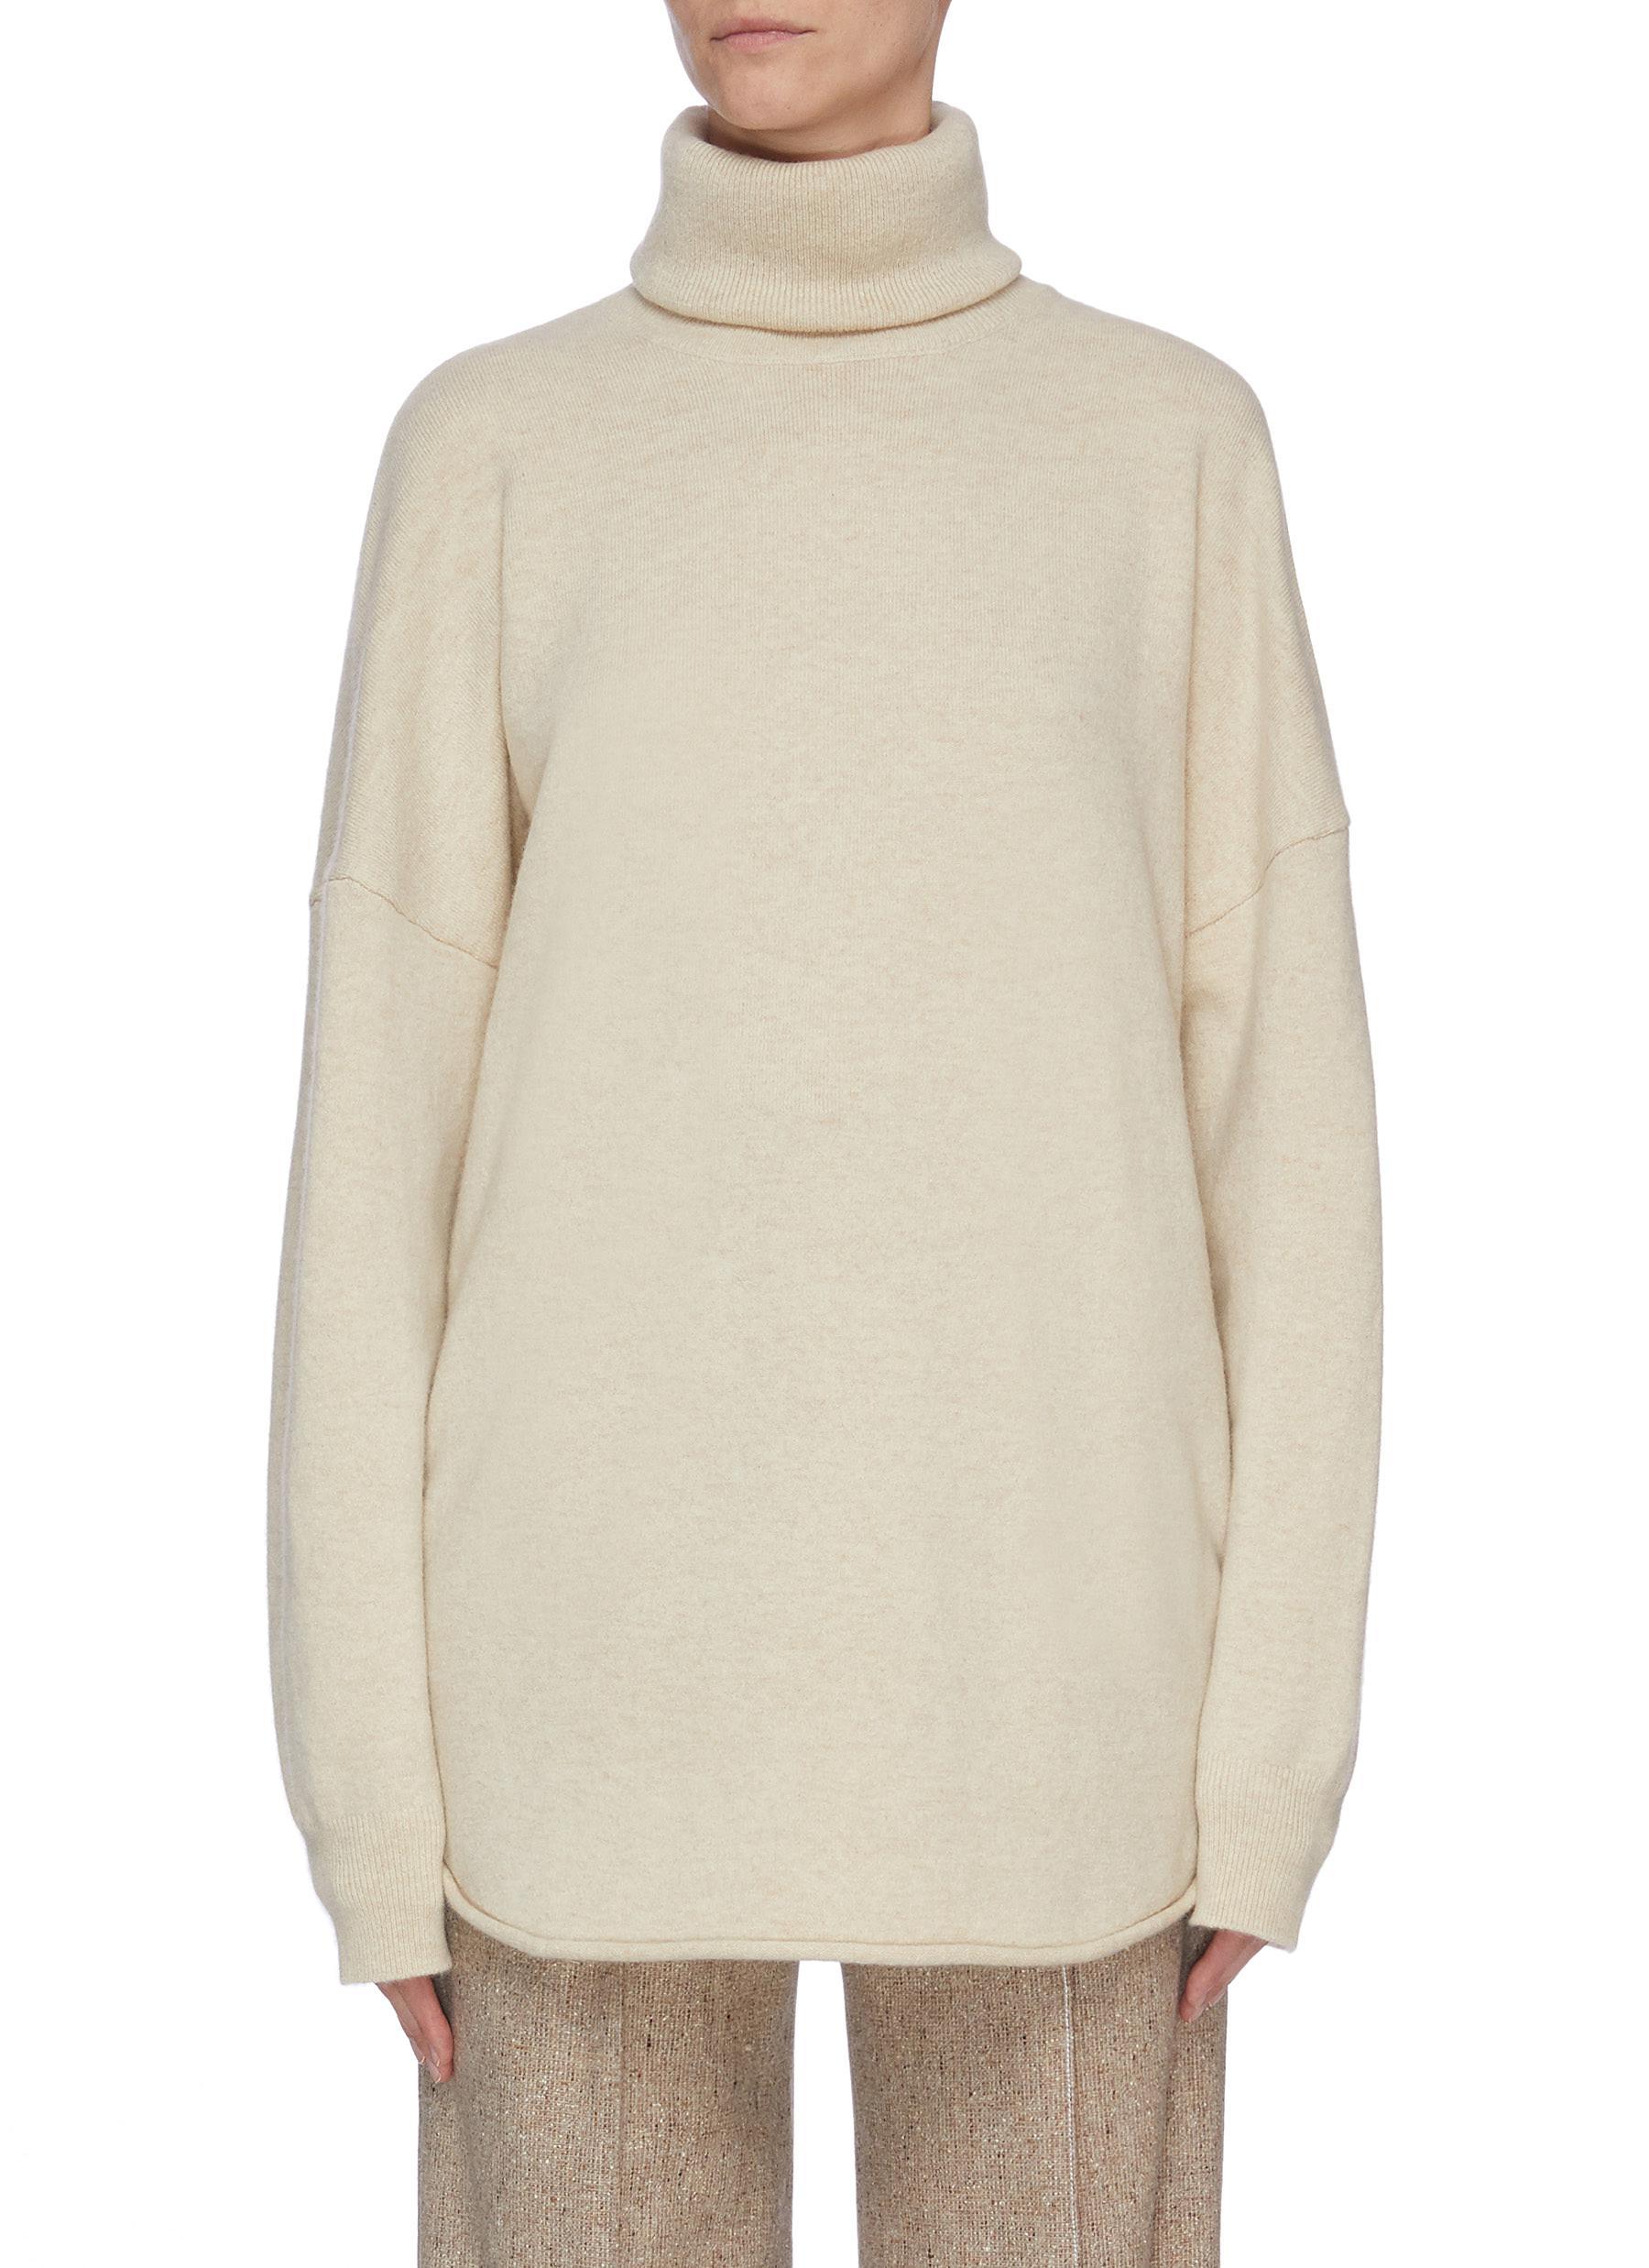 shop Extreme Cashmere Puff sleeve cashmere turtleneck knit top online